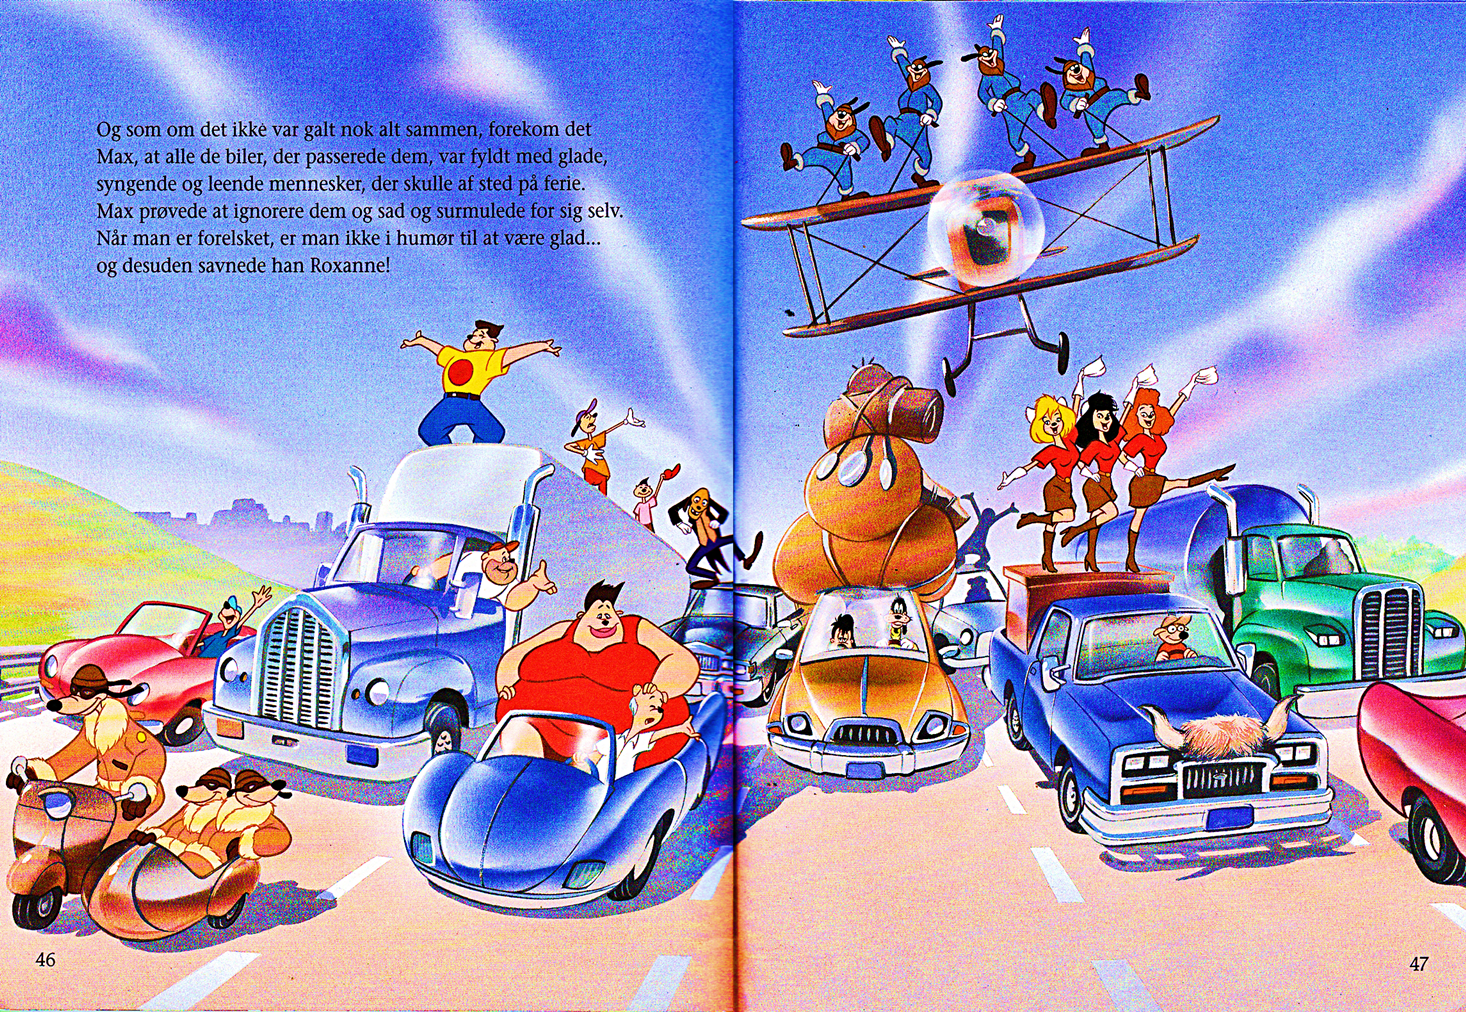 Walt Дисней Book Scans – A Goofy Movie: The Story of Max Goof (Danish Version)